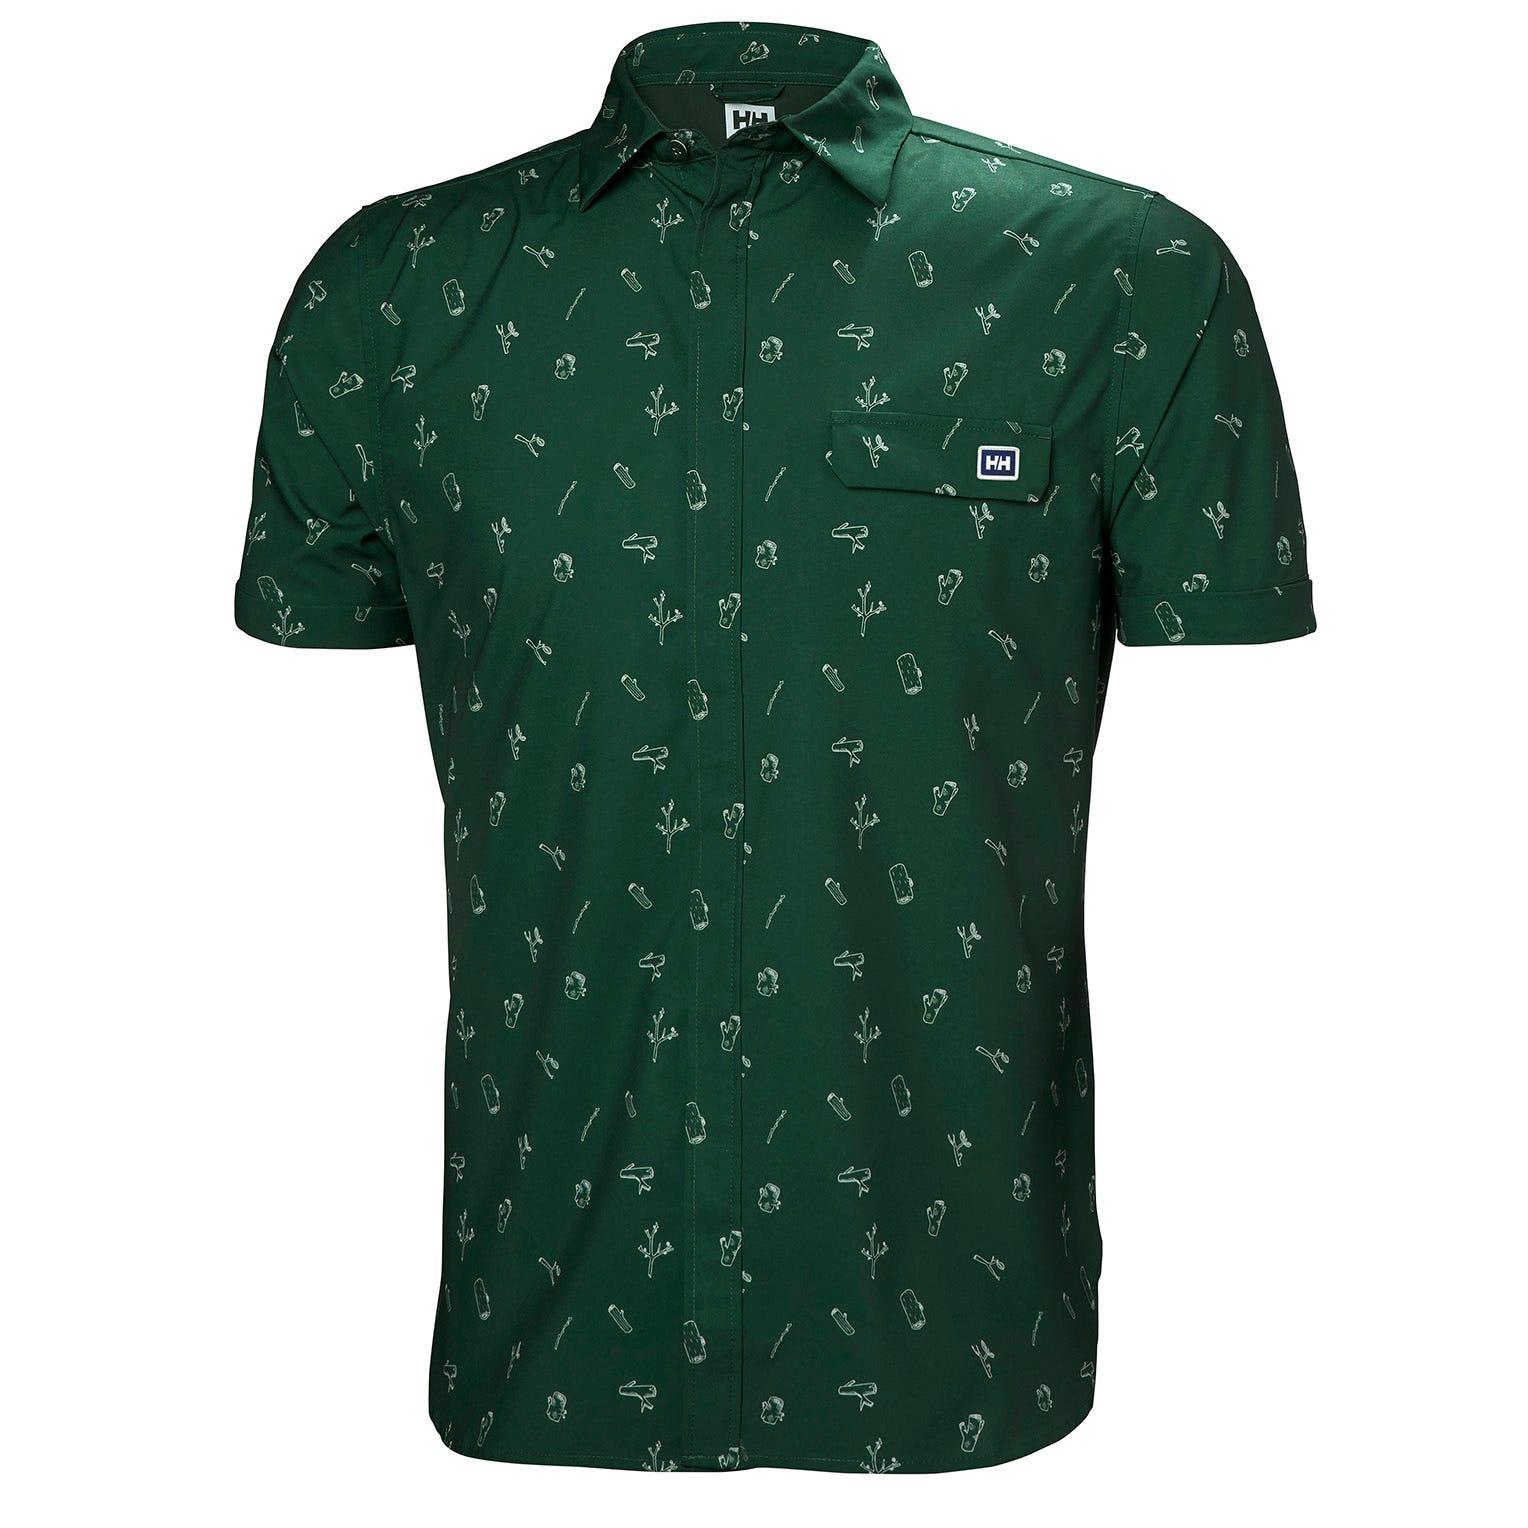 Helly Hansen Oya Shirt Mens Midlayer Green XL